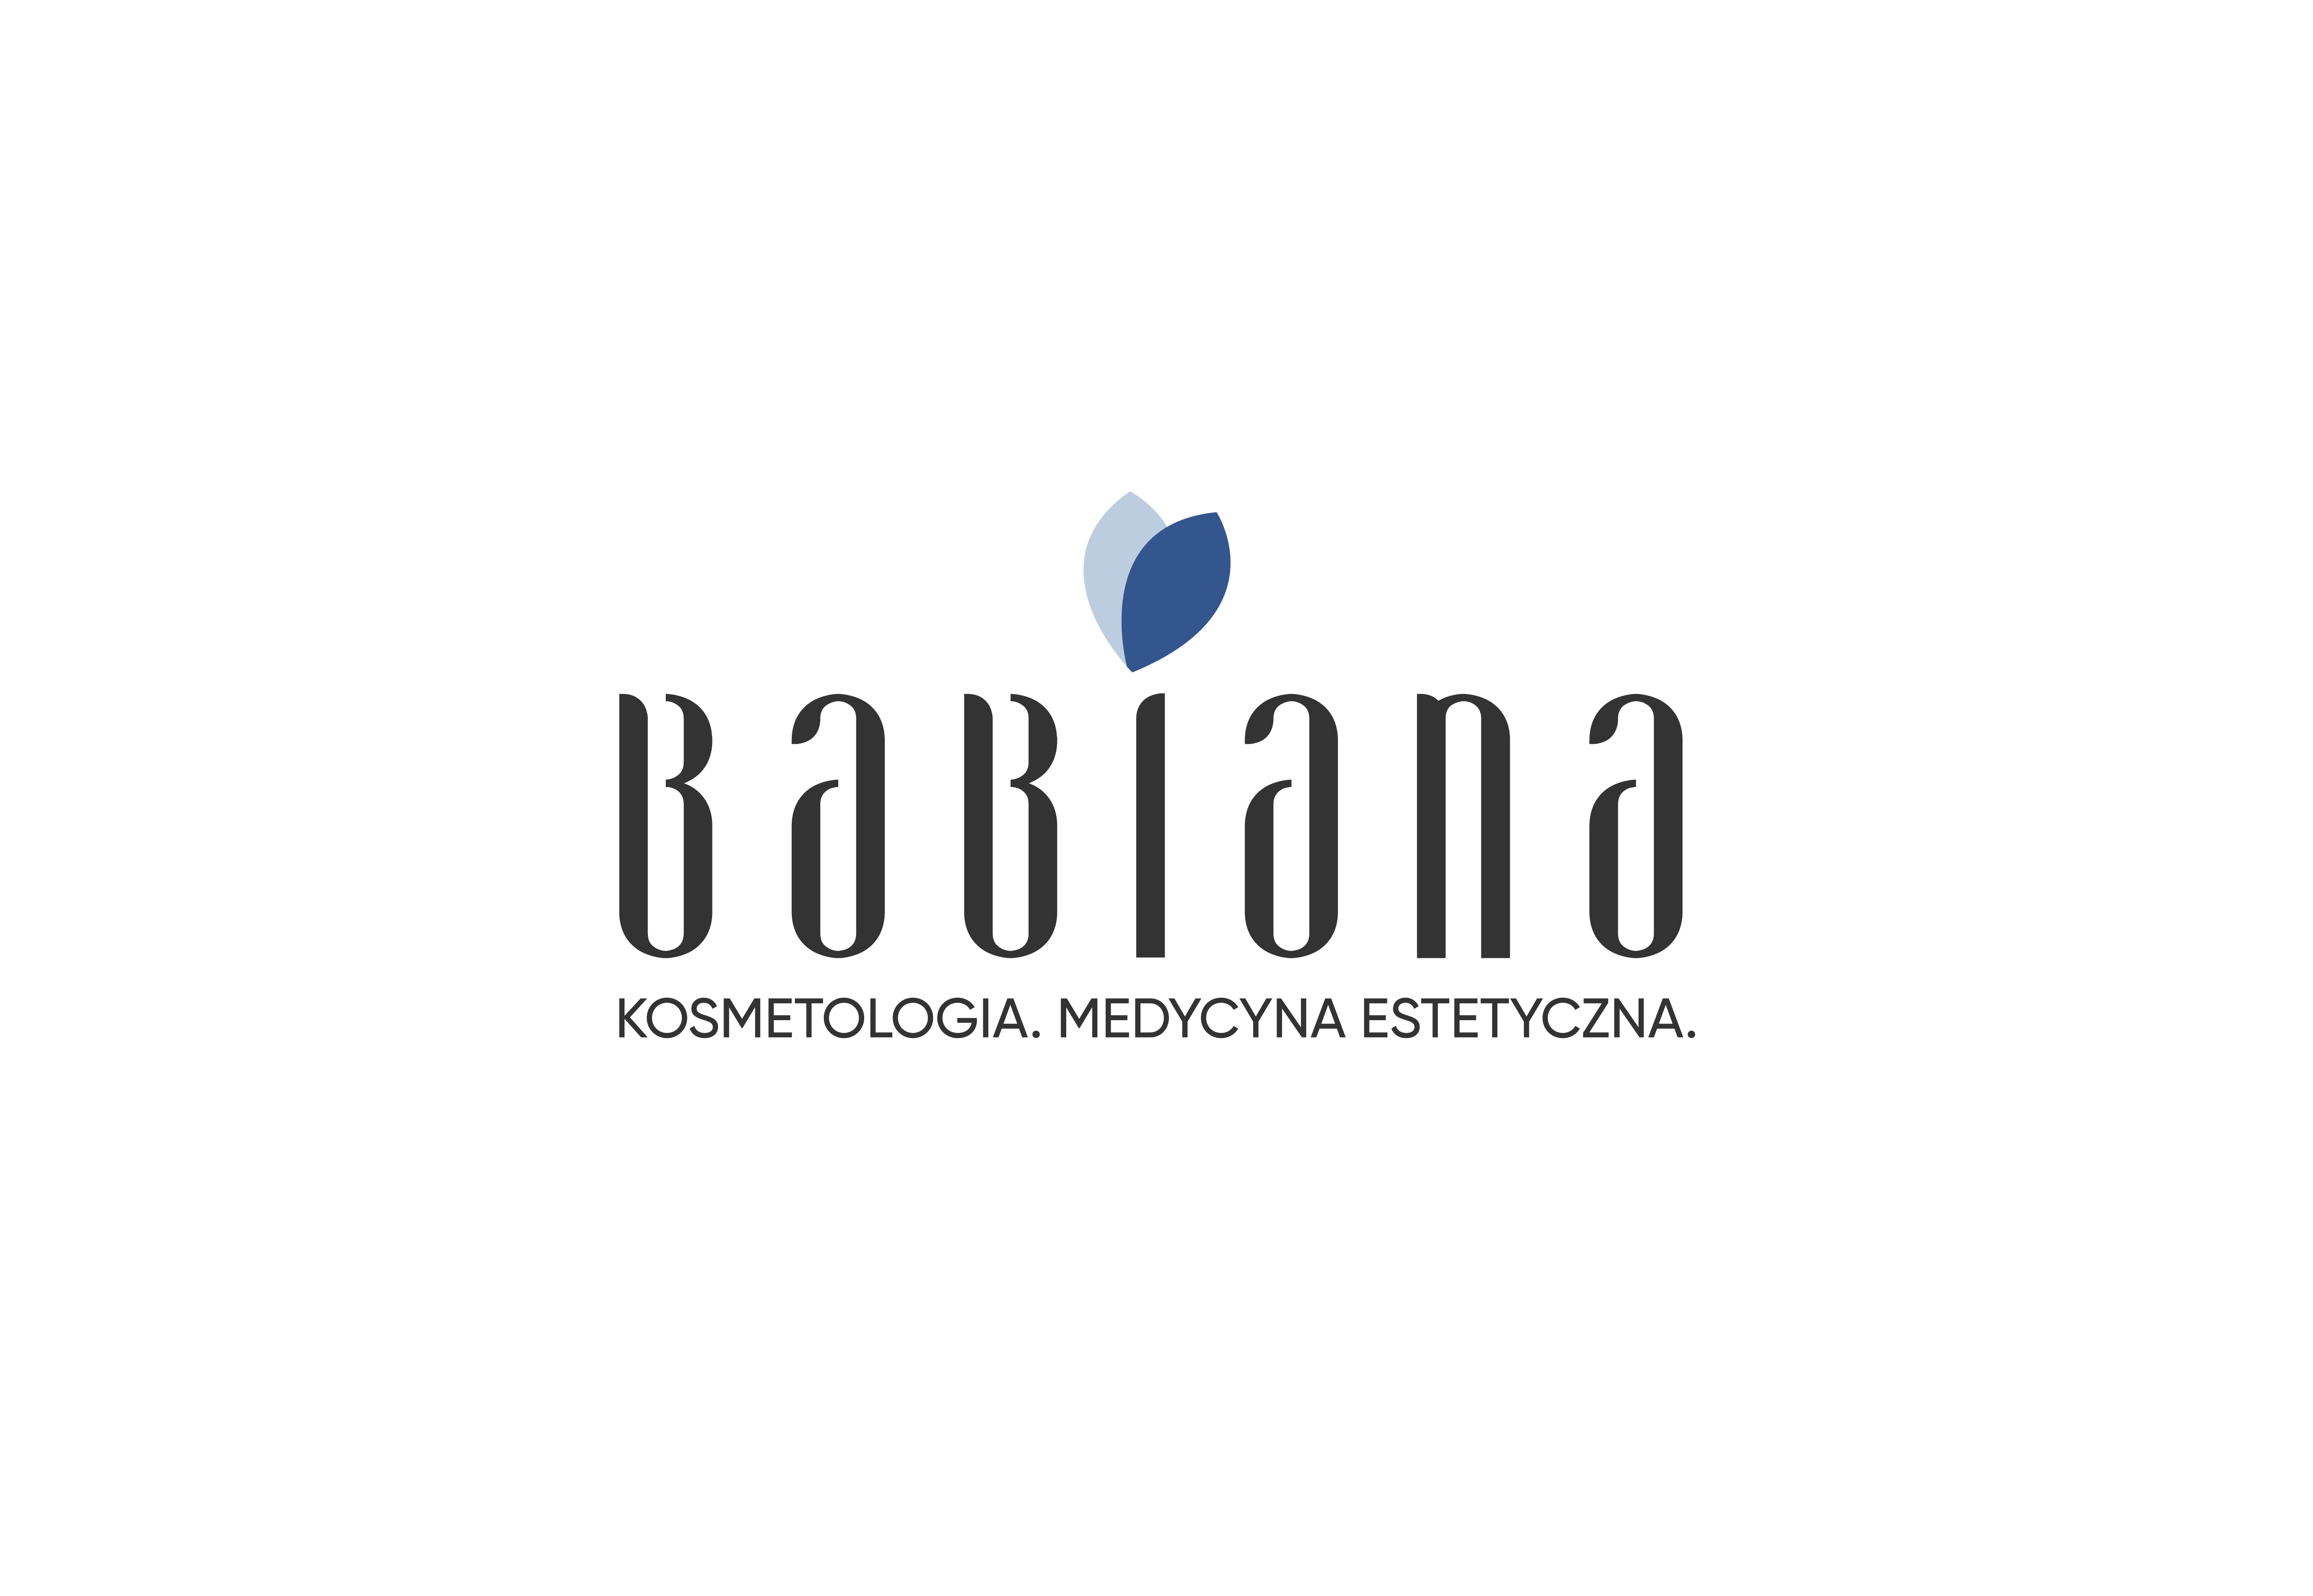 Babiana Kosmetyka